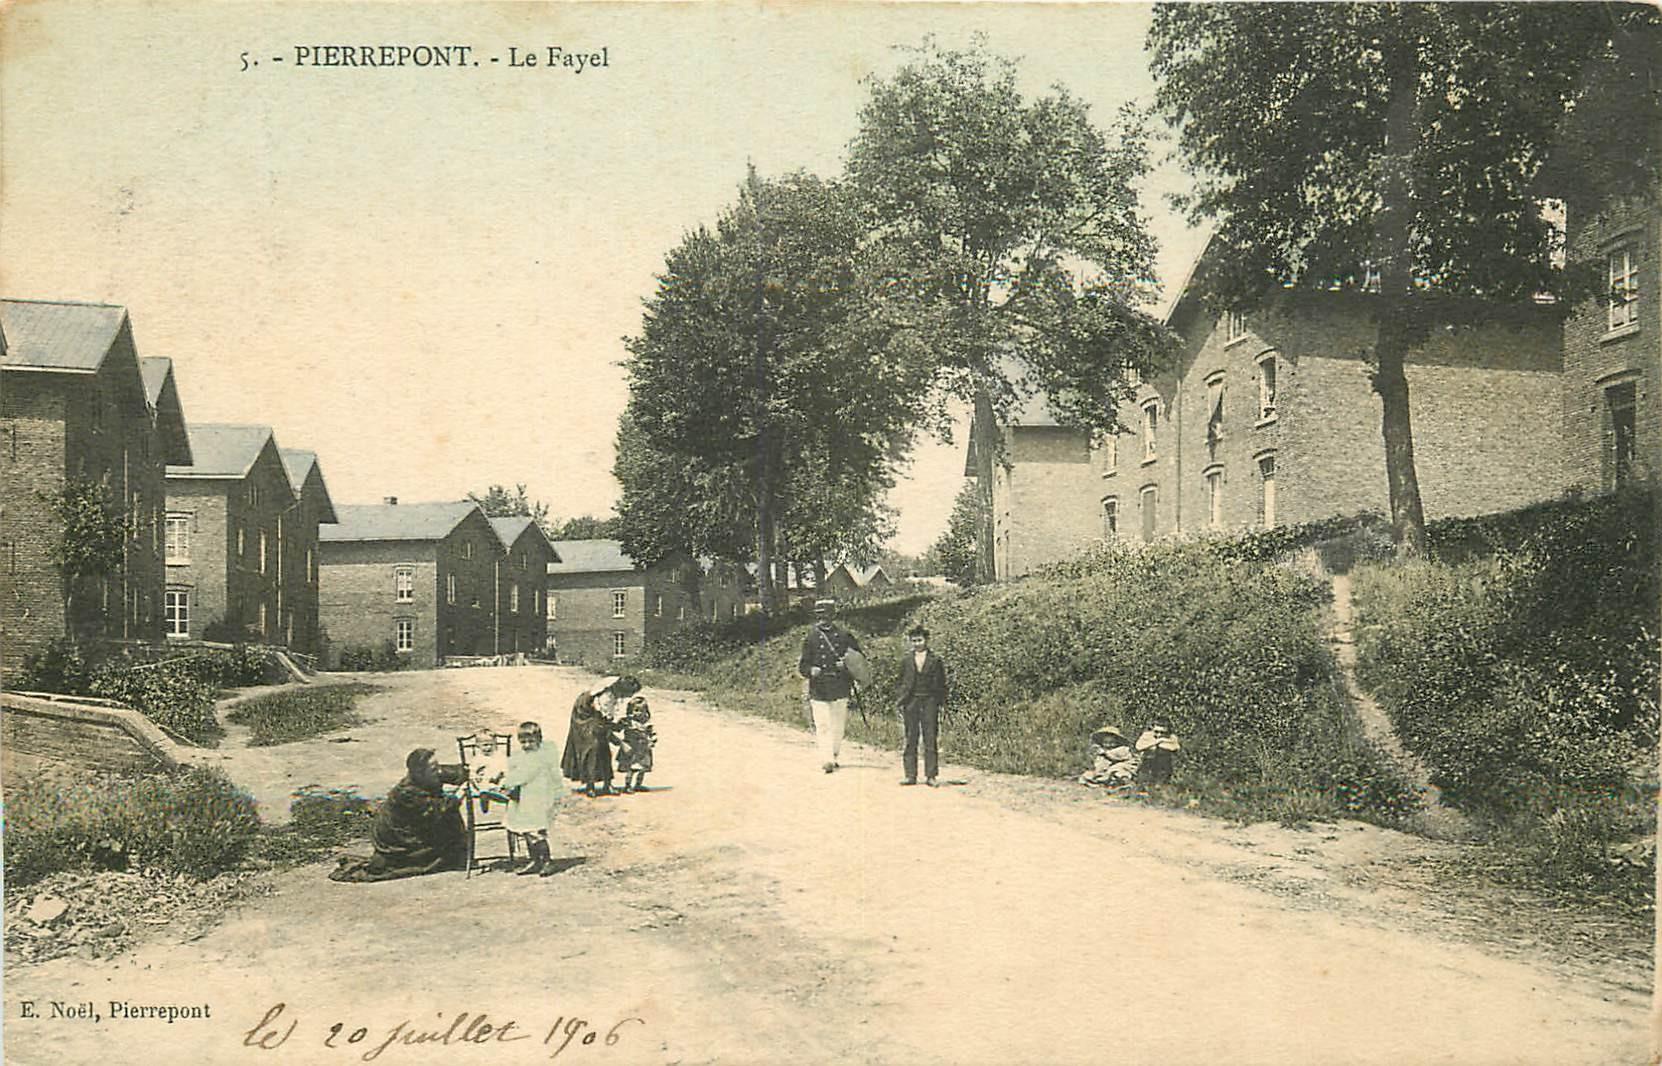 WW 54 PIERREPONT. Le Fayel avec Gendarme 1906